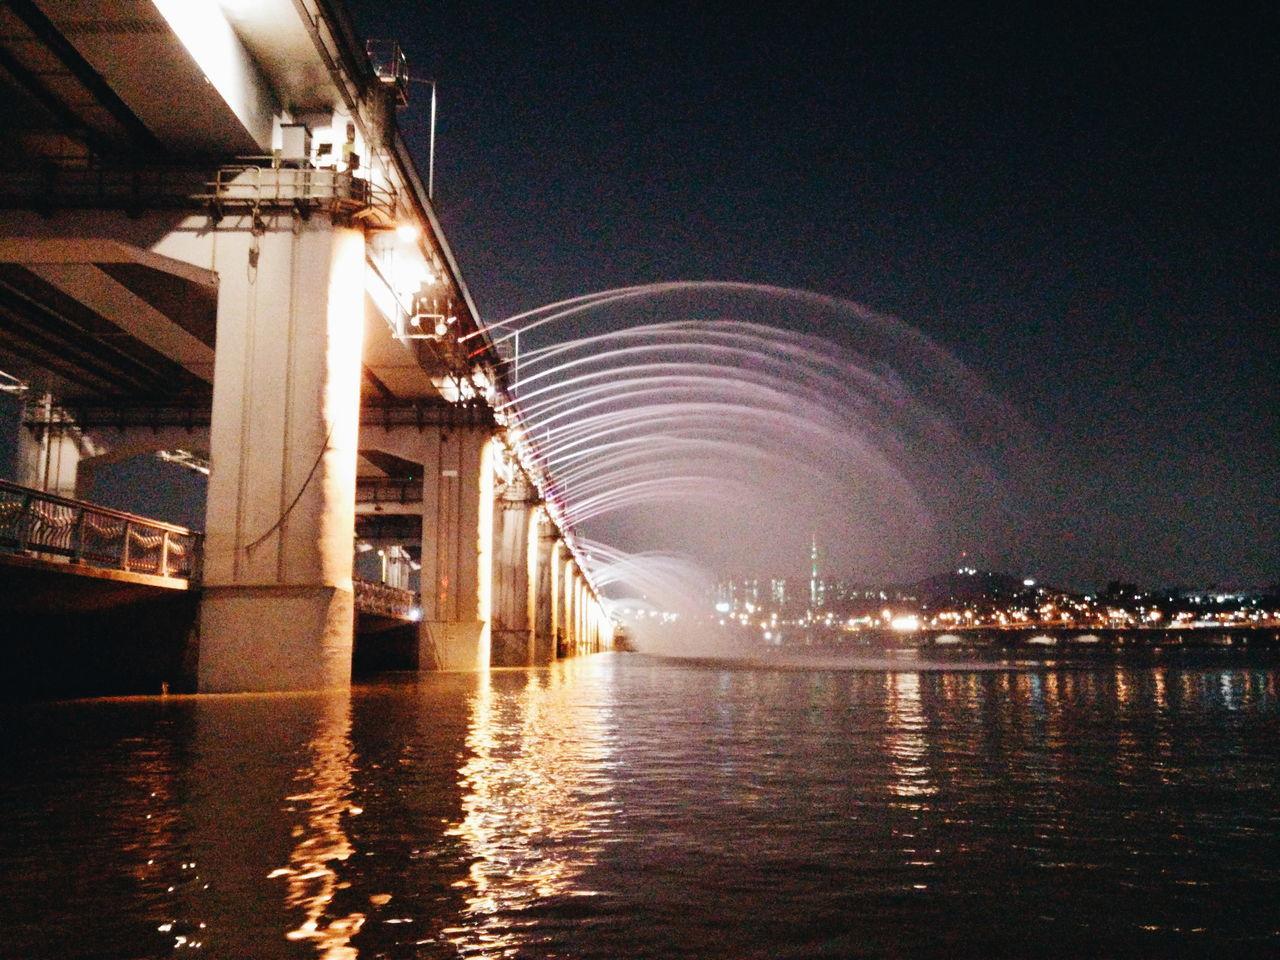 Banpo Hangang Park Banpo Bridge Han River Seoul Han River Night banpo bridge at night Rainbow Fountain Fountain Show